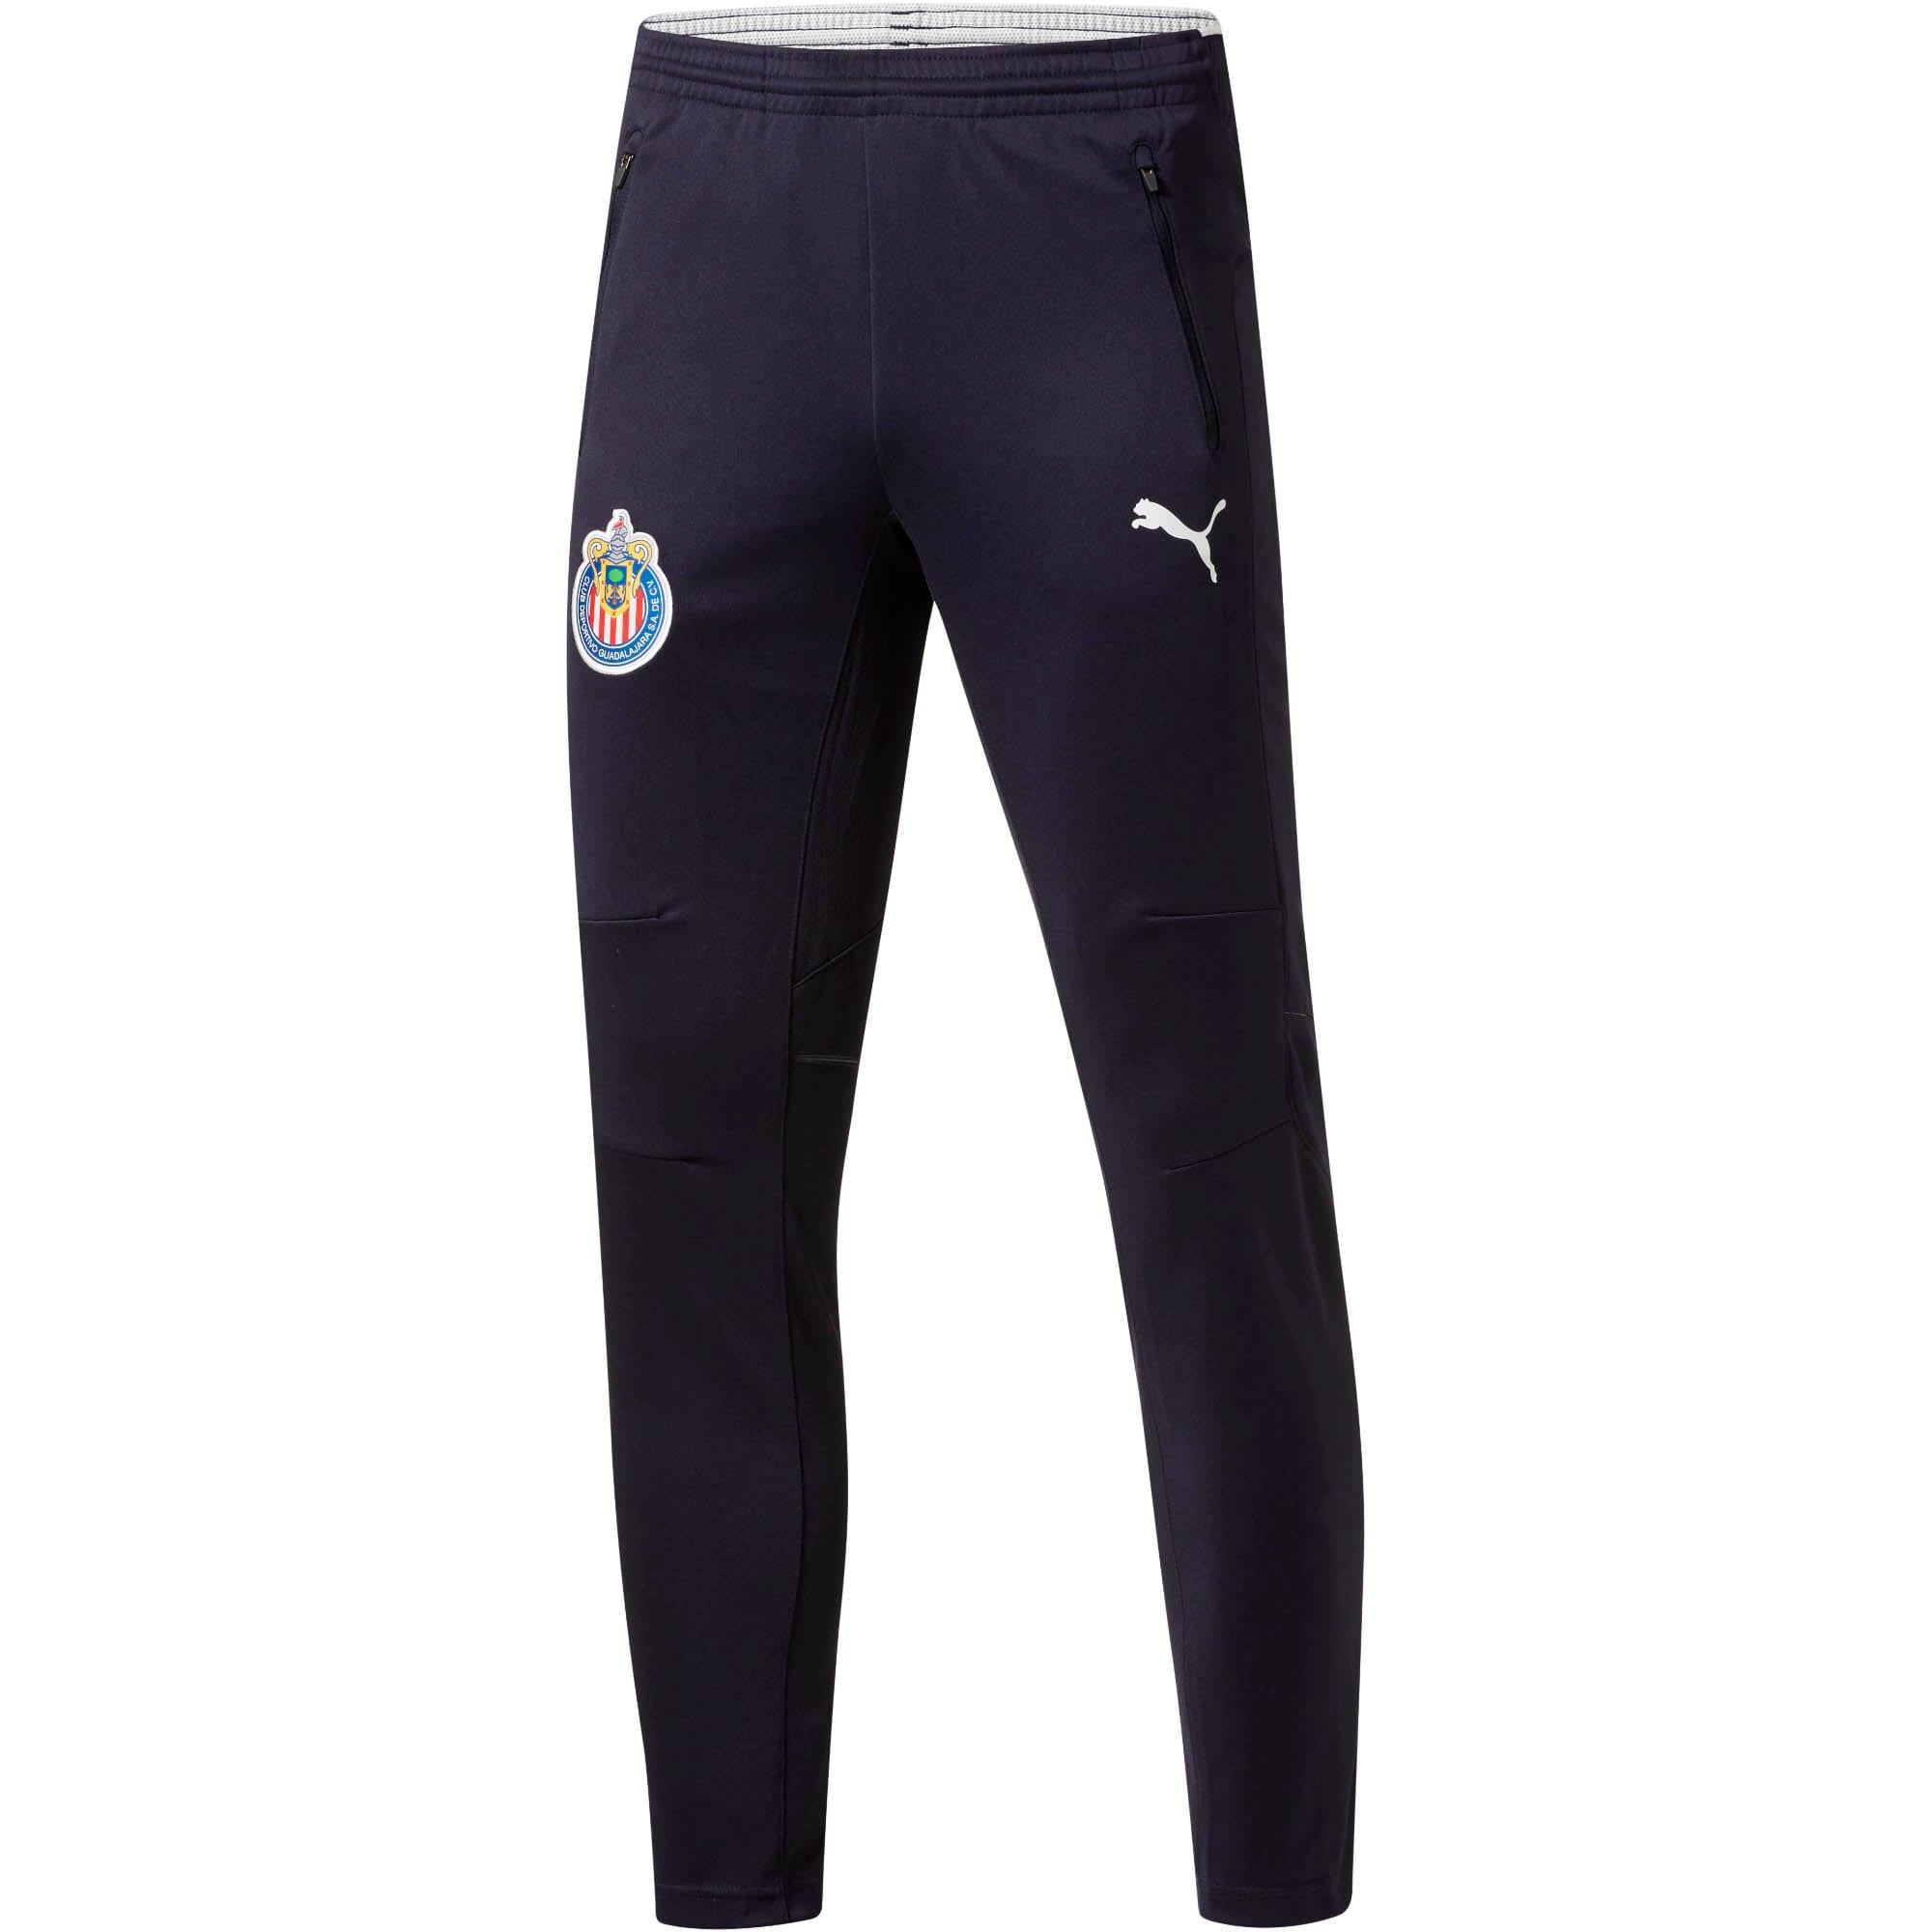 PUMA Mens Standard Ac Milan Training Pants with Zipped Pocket